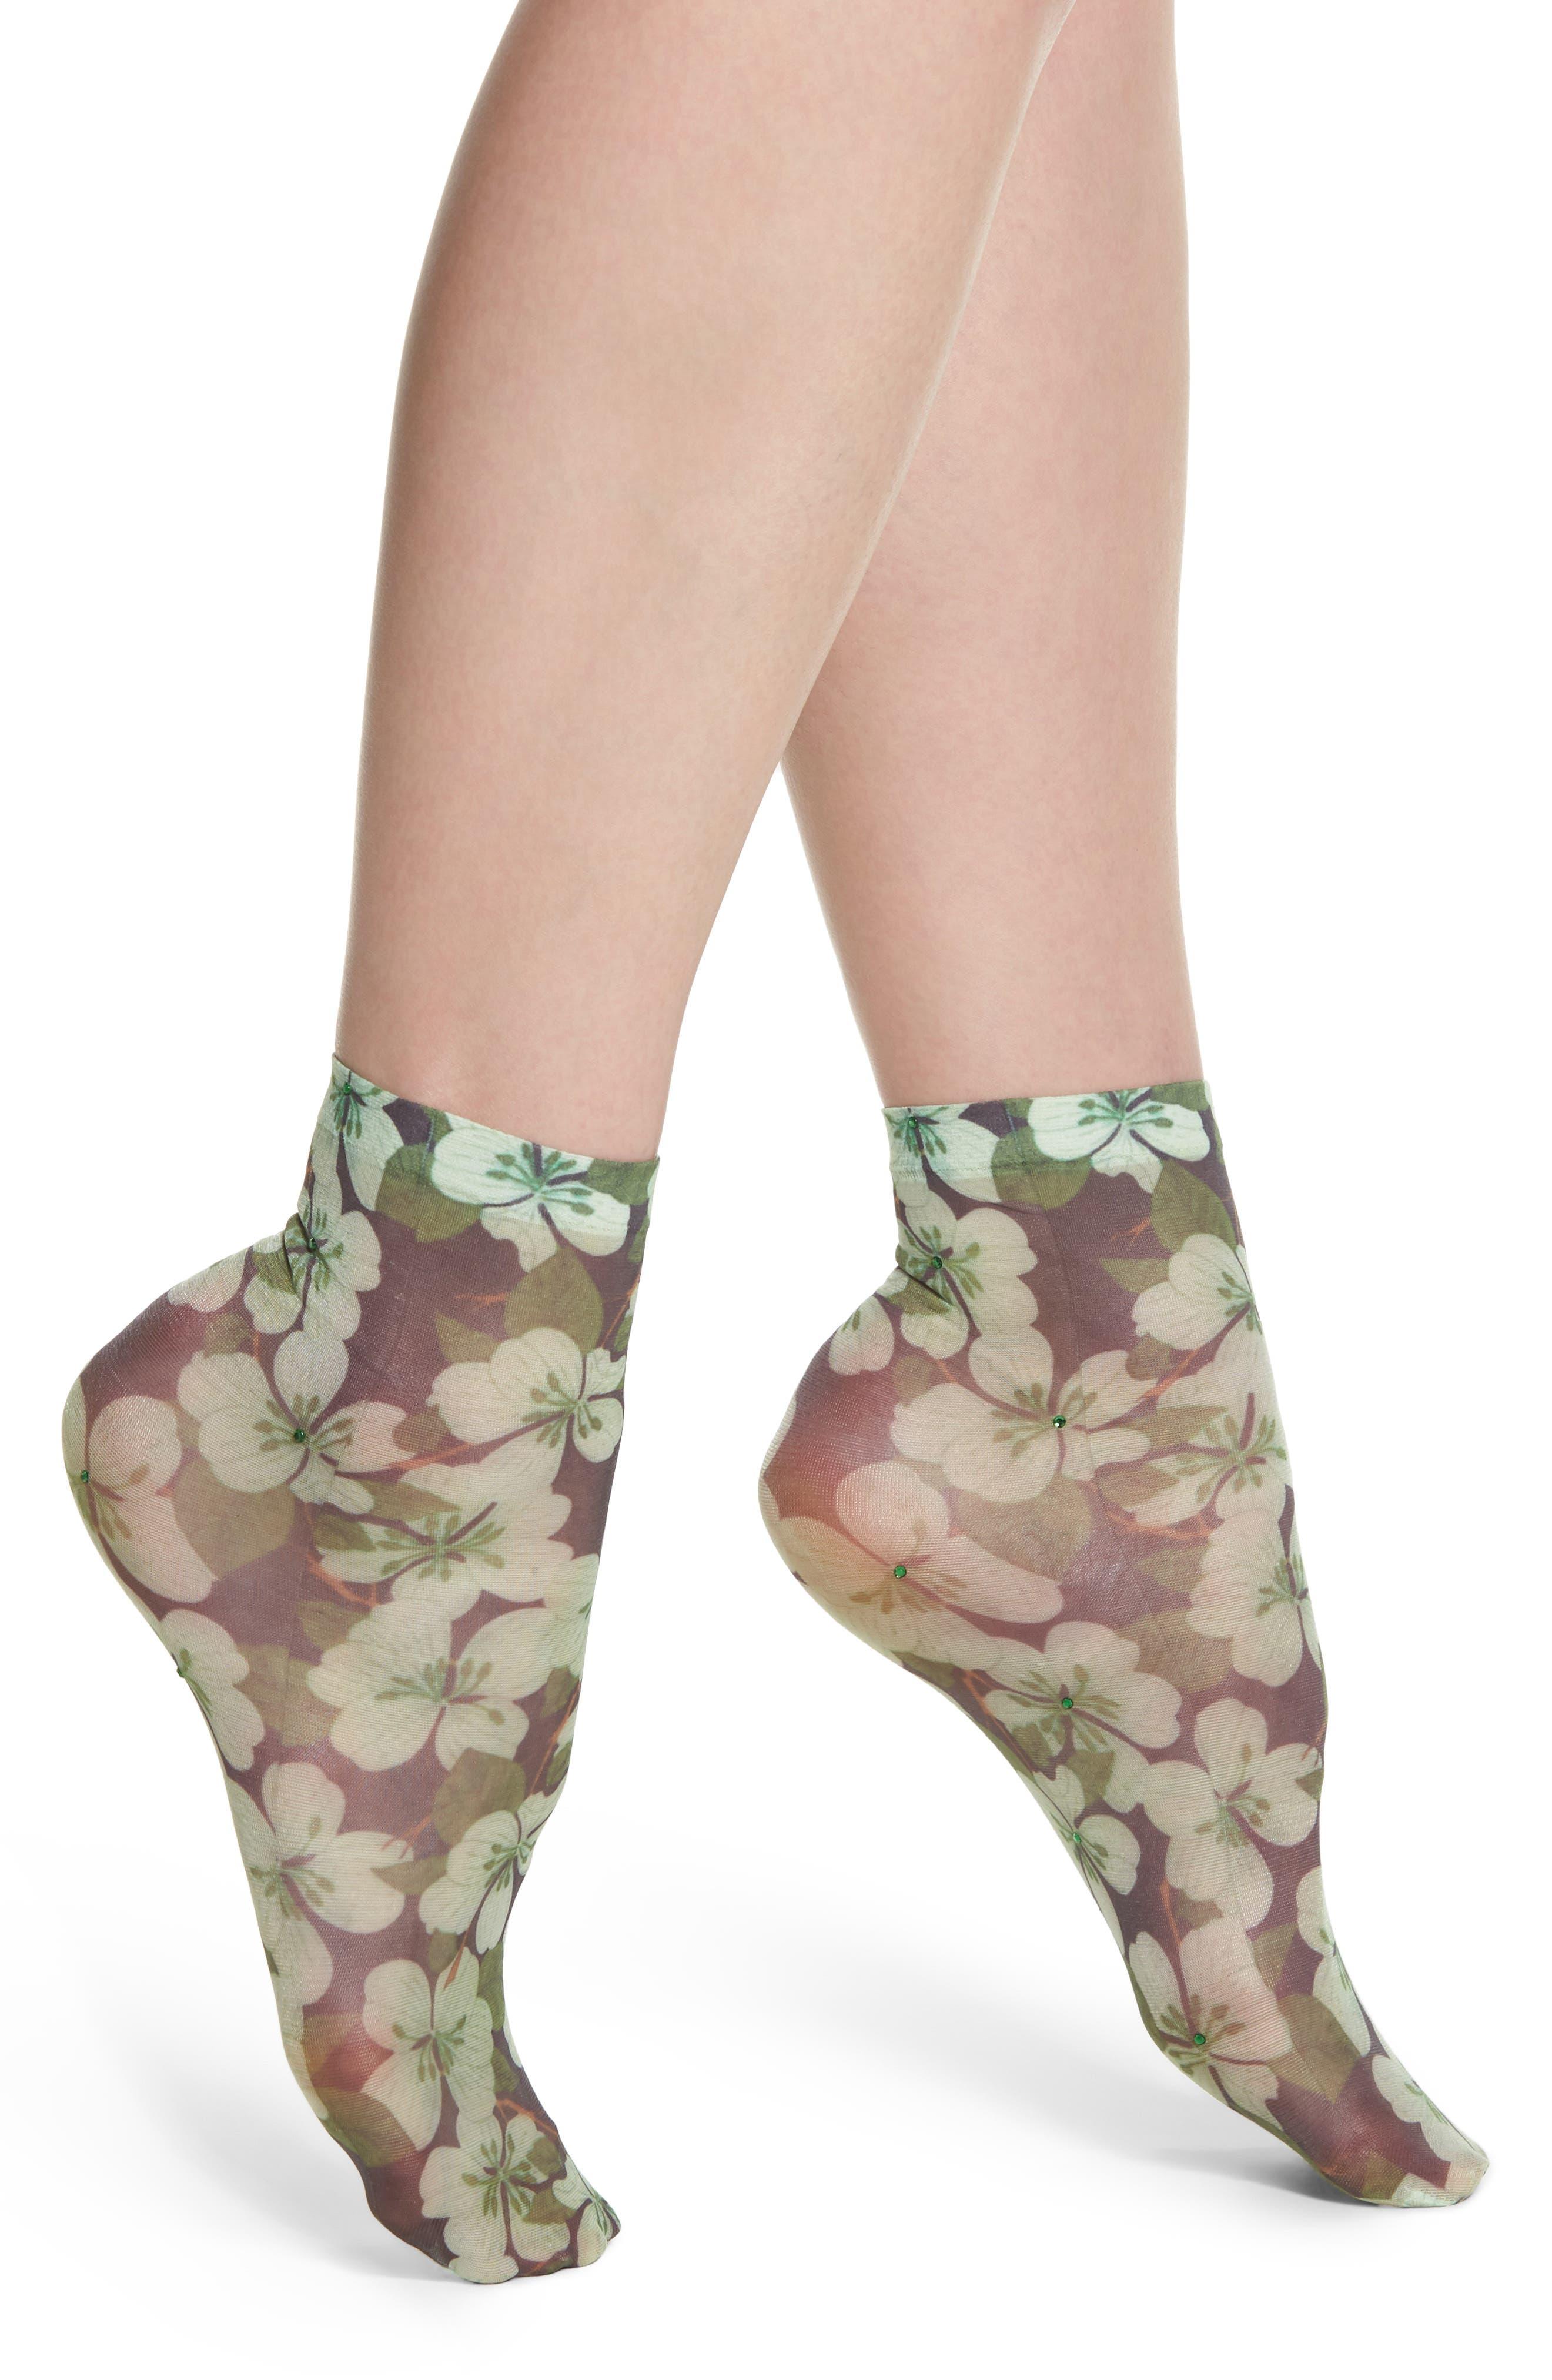 Annavittoria Ankle Socks,                             Main thumbnail 1, color,                             Fiore Strass